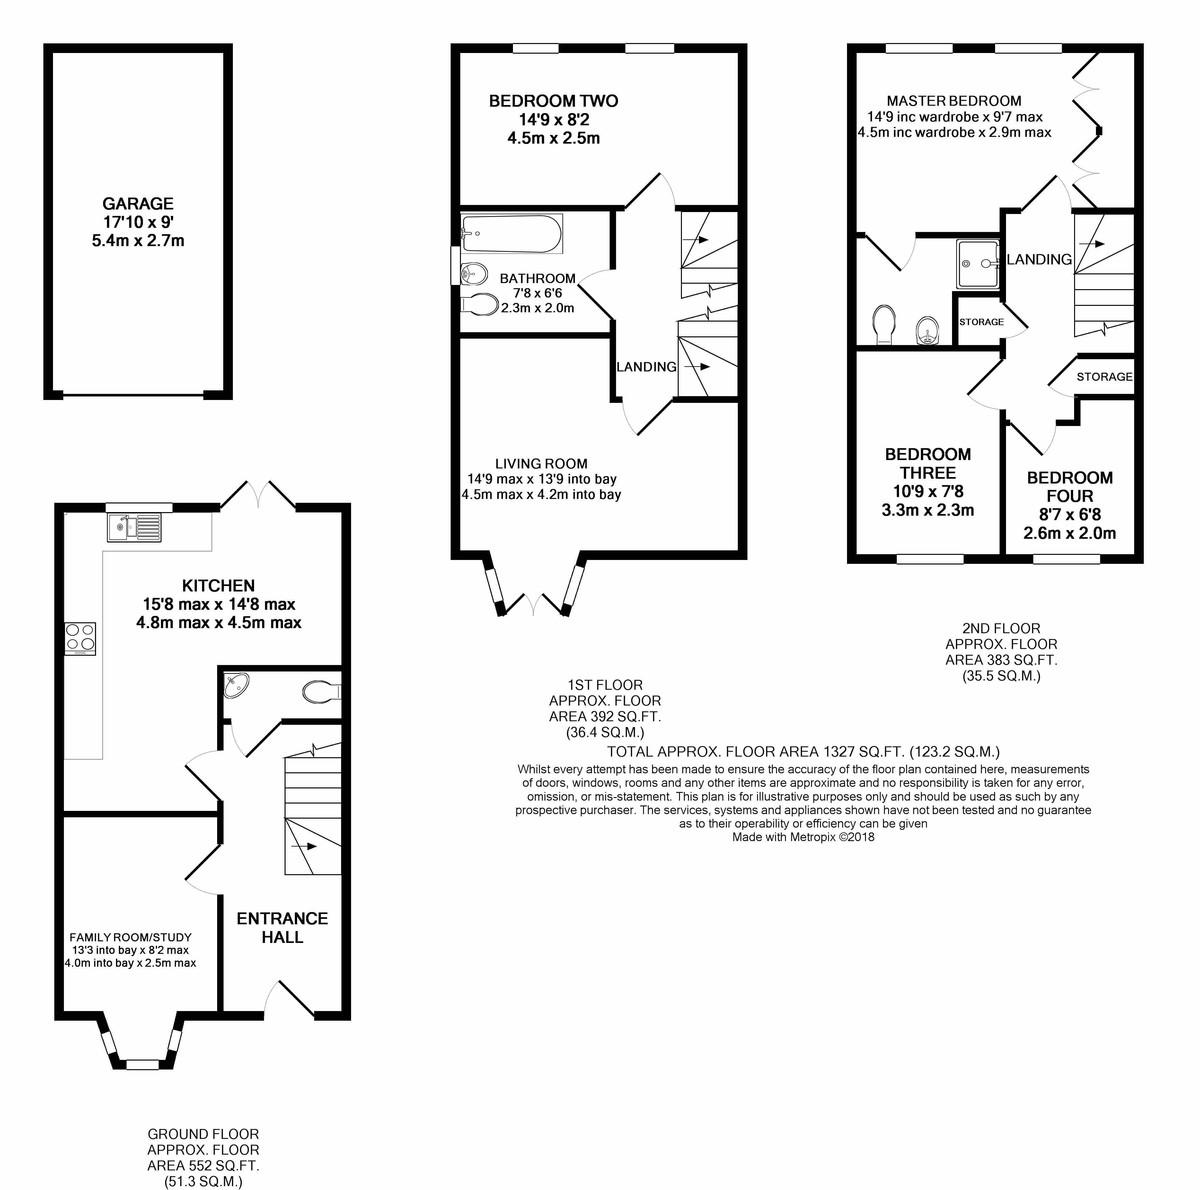 Barley Road, Edgbaston floorplan 1 of 1